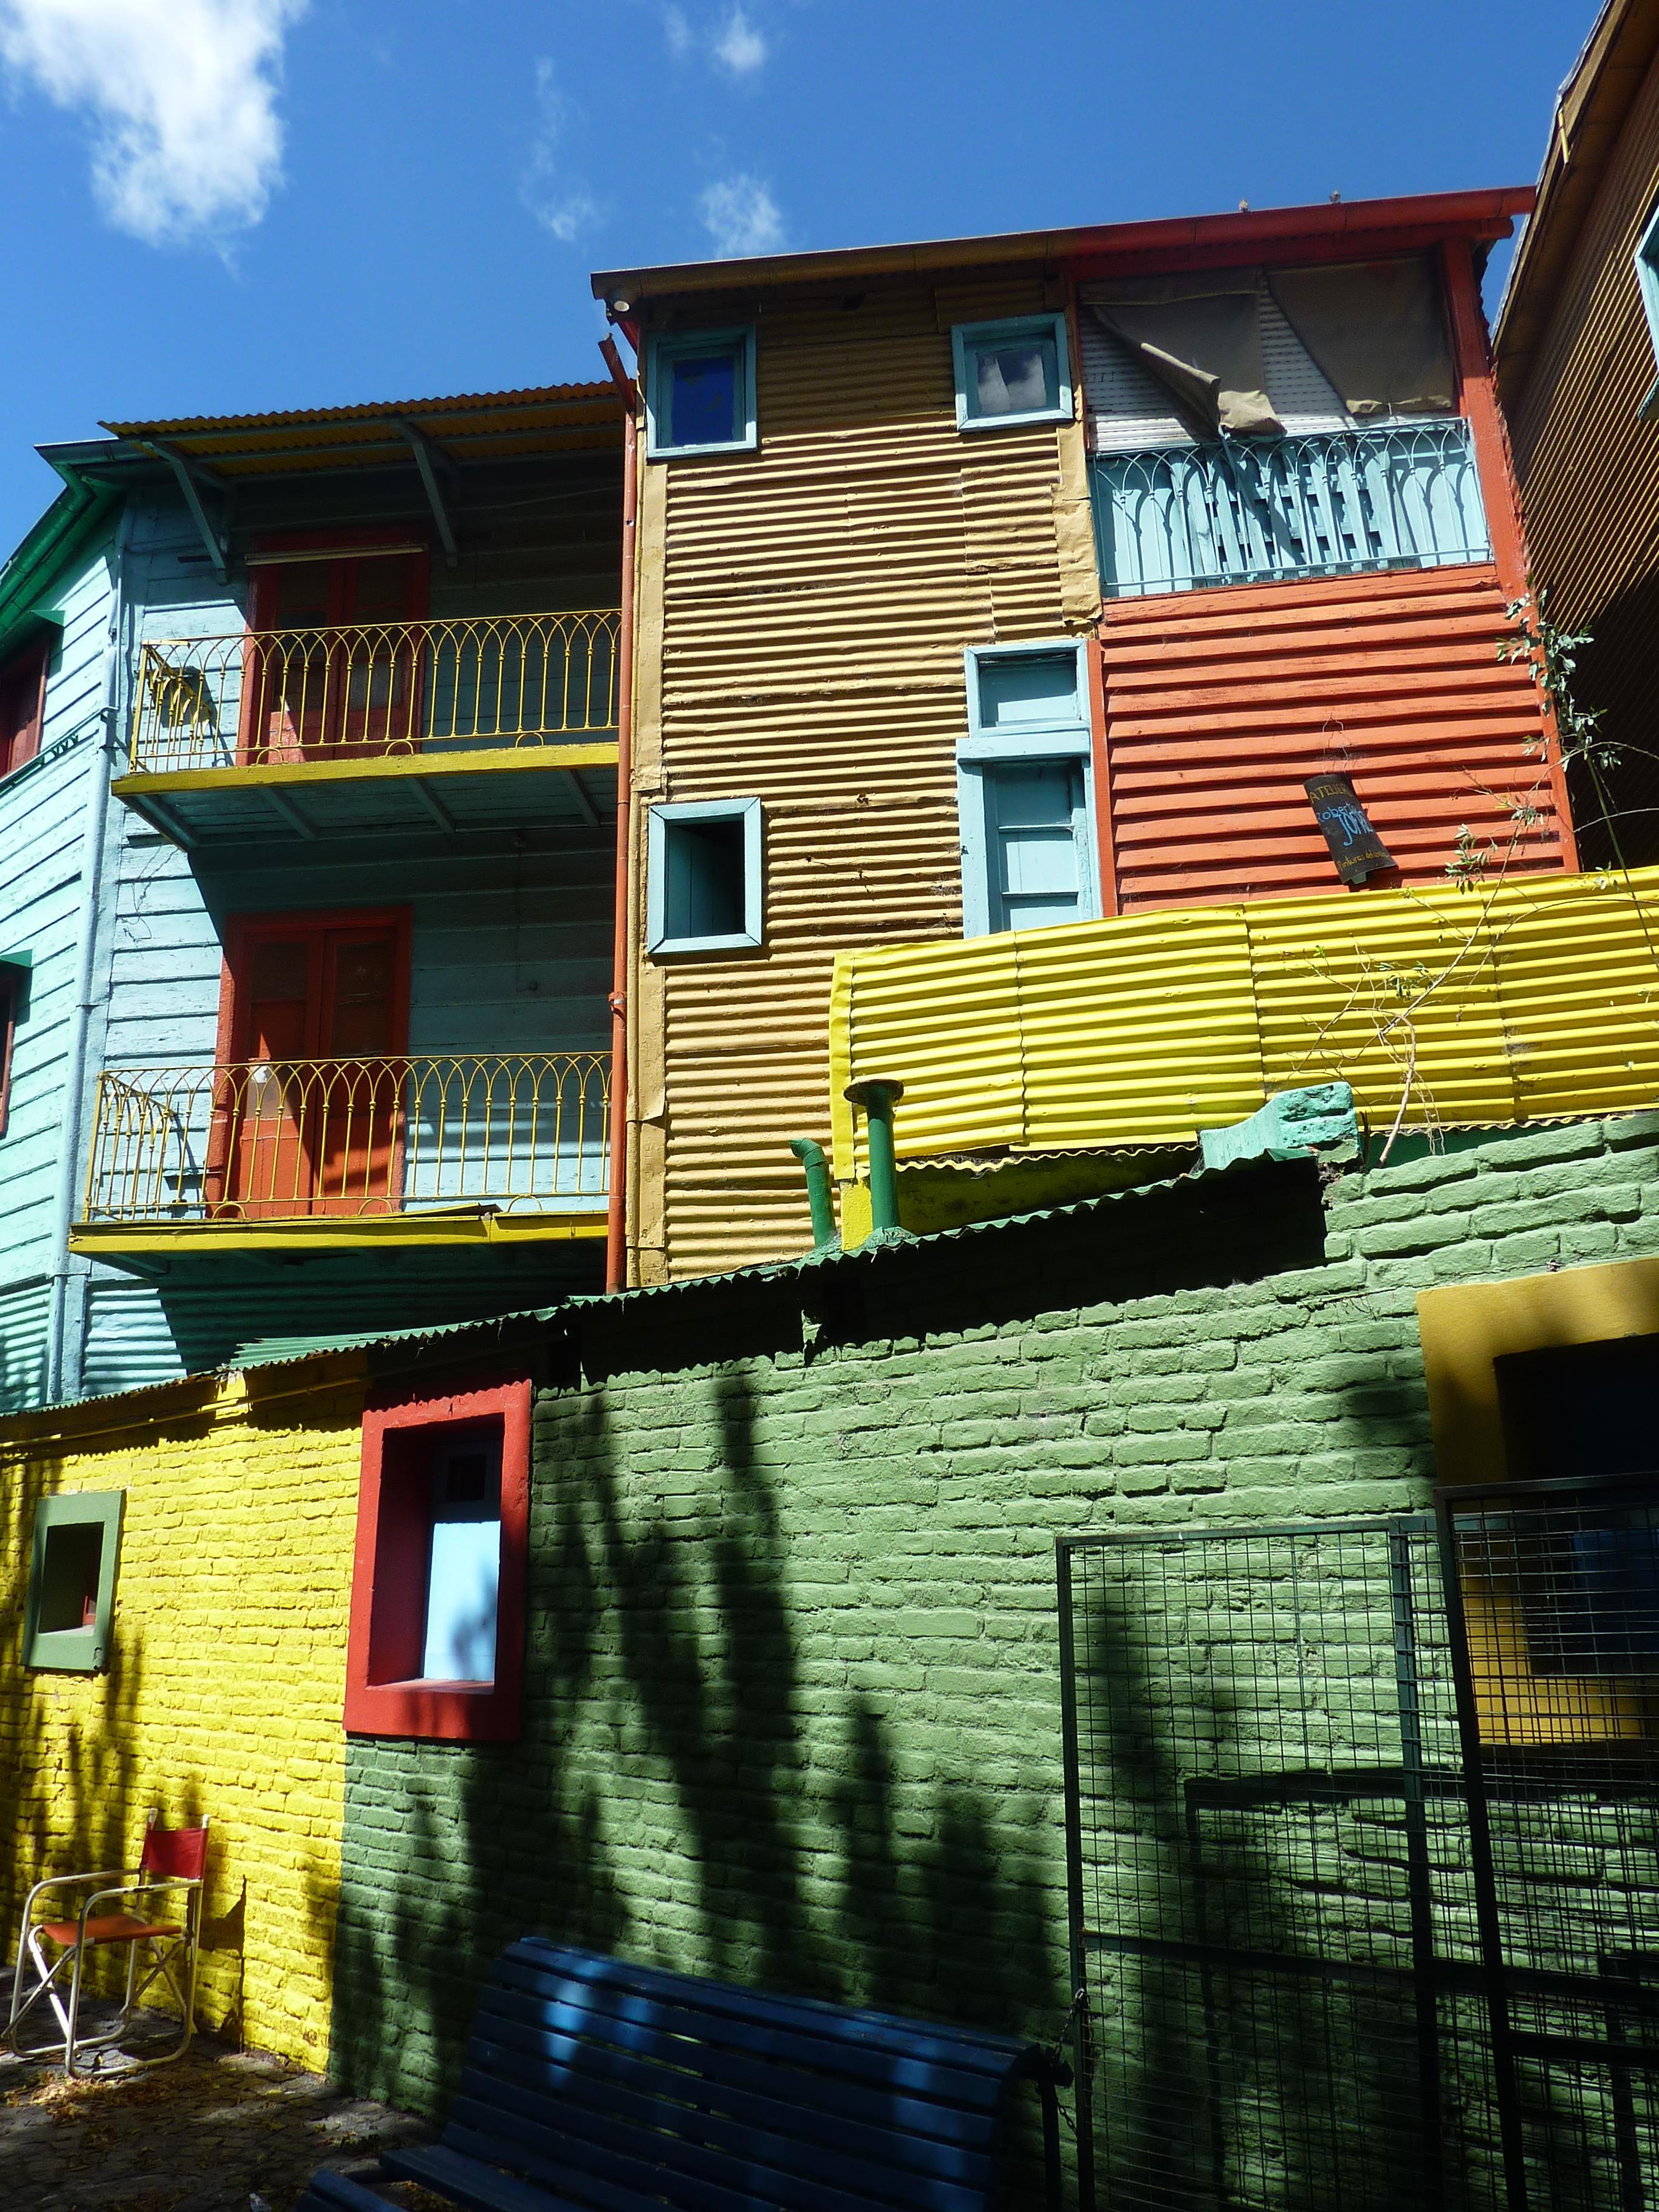 Fotos gratis arquitectura madera casa ventana pueblo for Fabrica de ventanas de madera en buenos aires